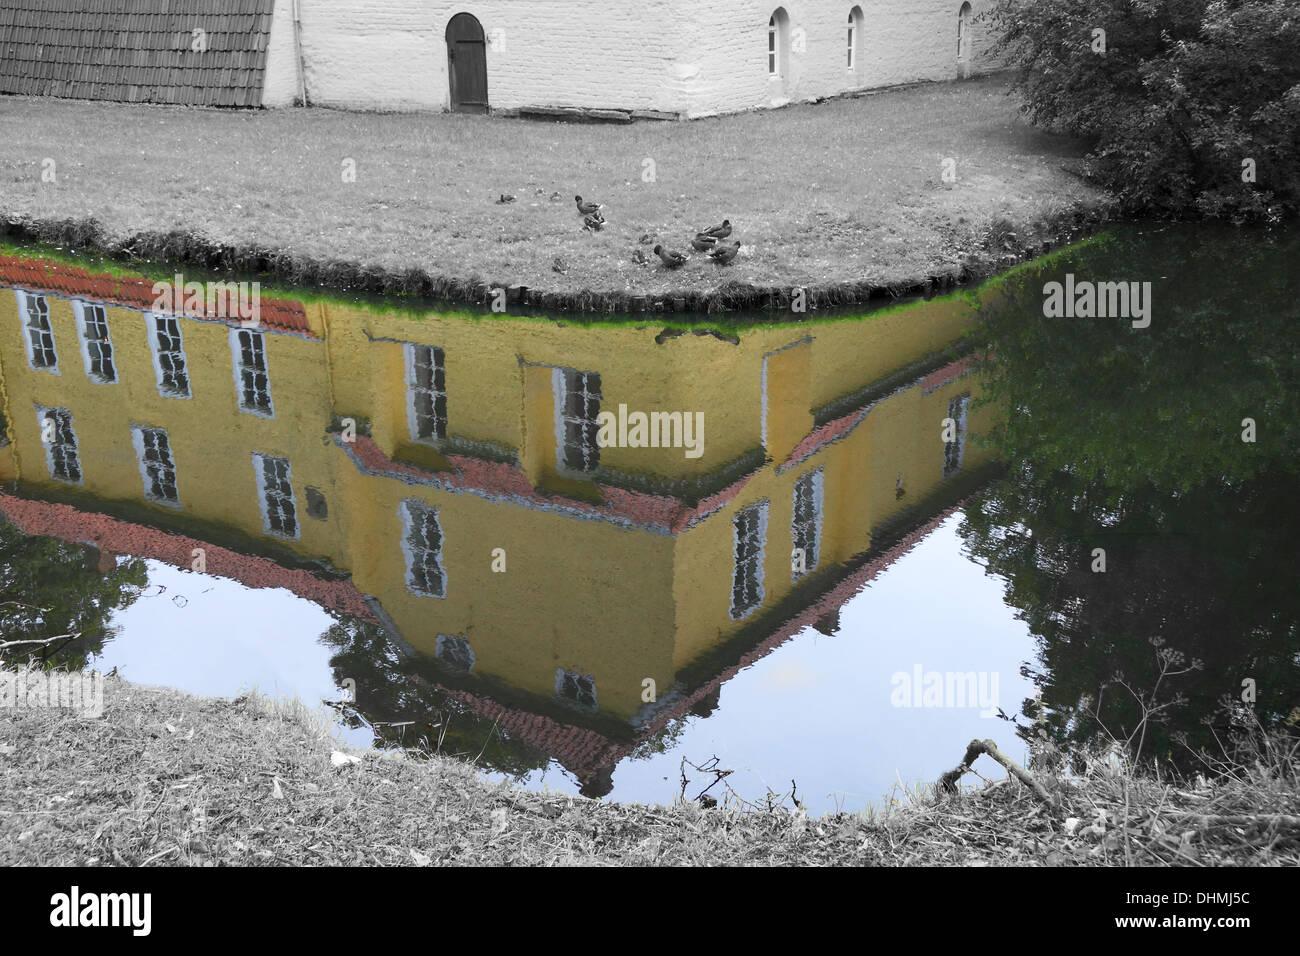 Maninga castle reflection in the moat - Stock Image